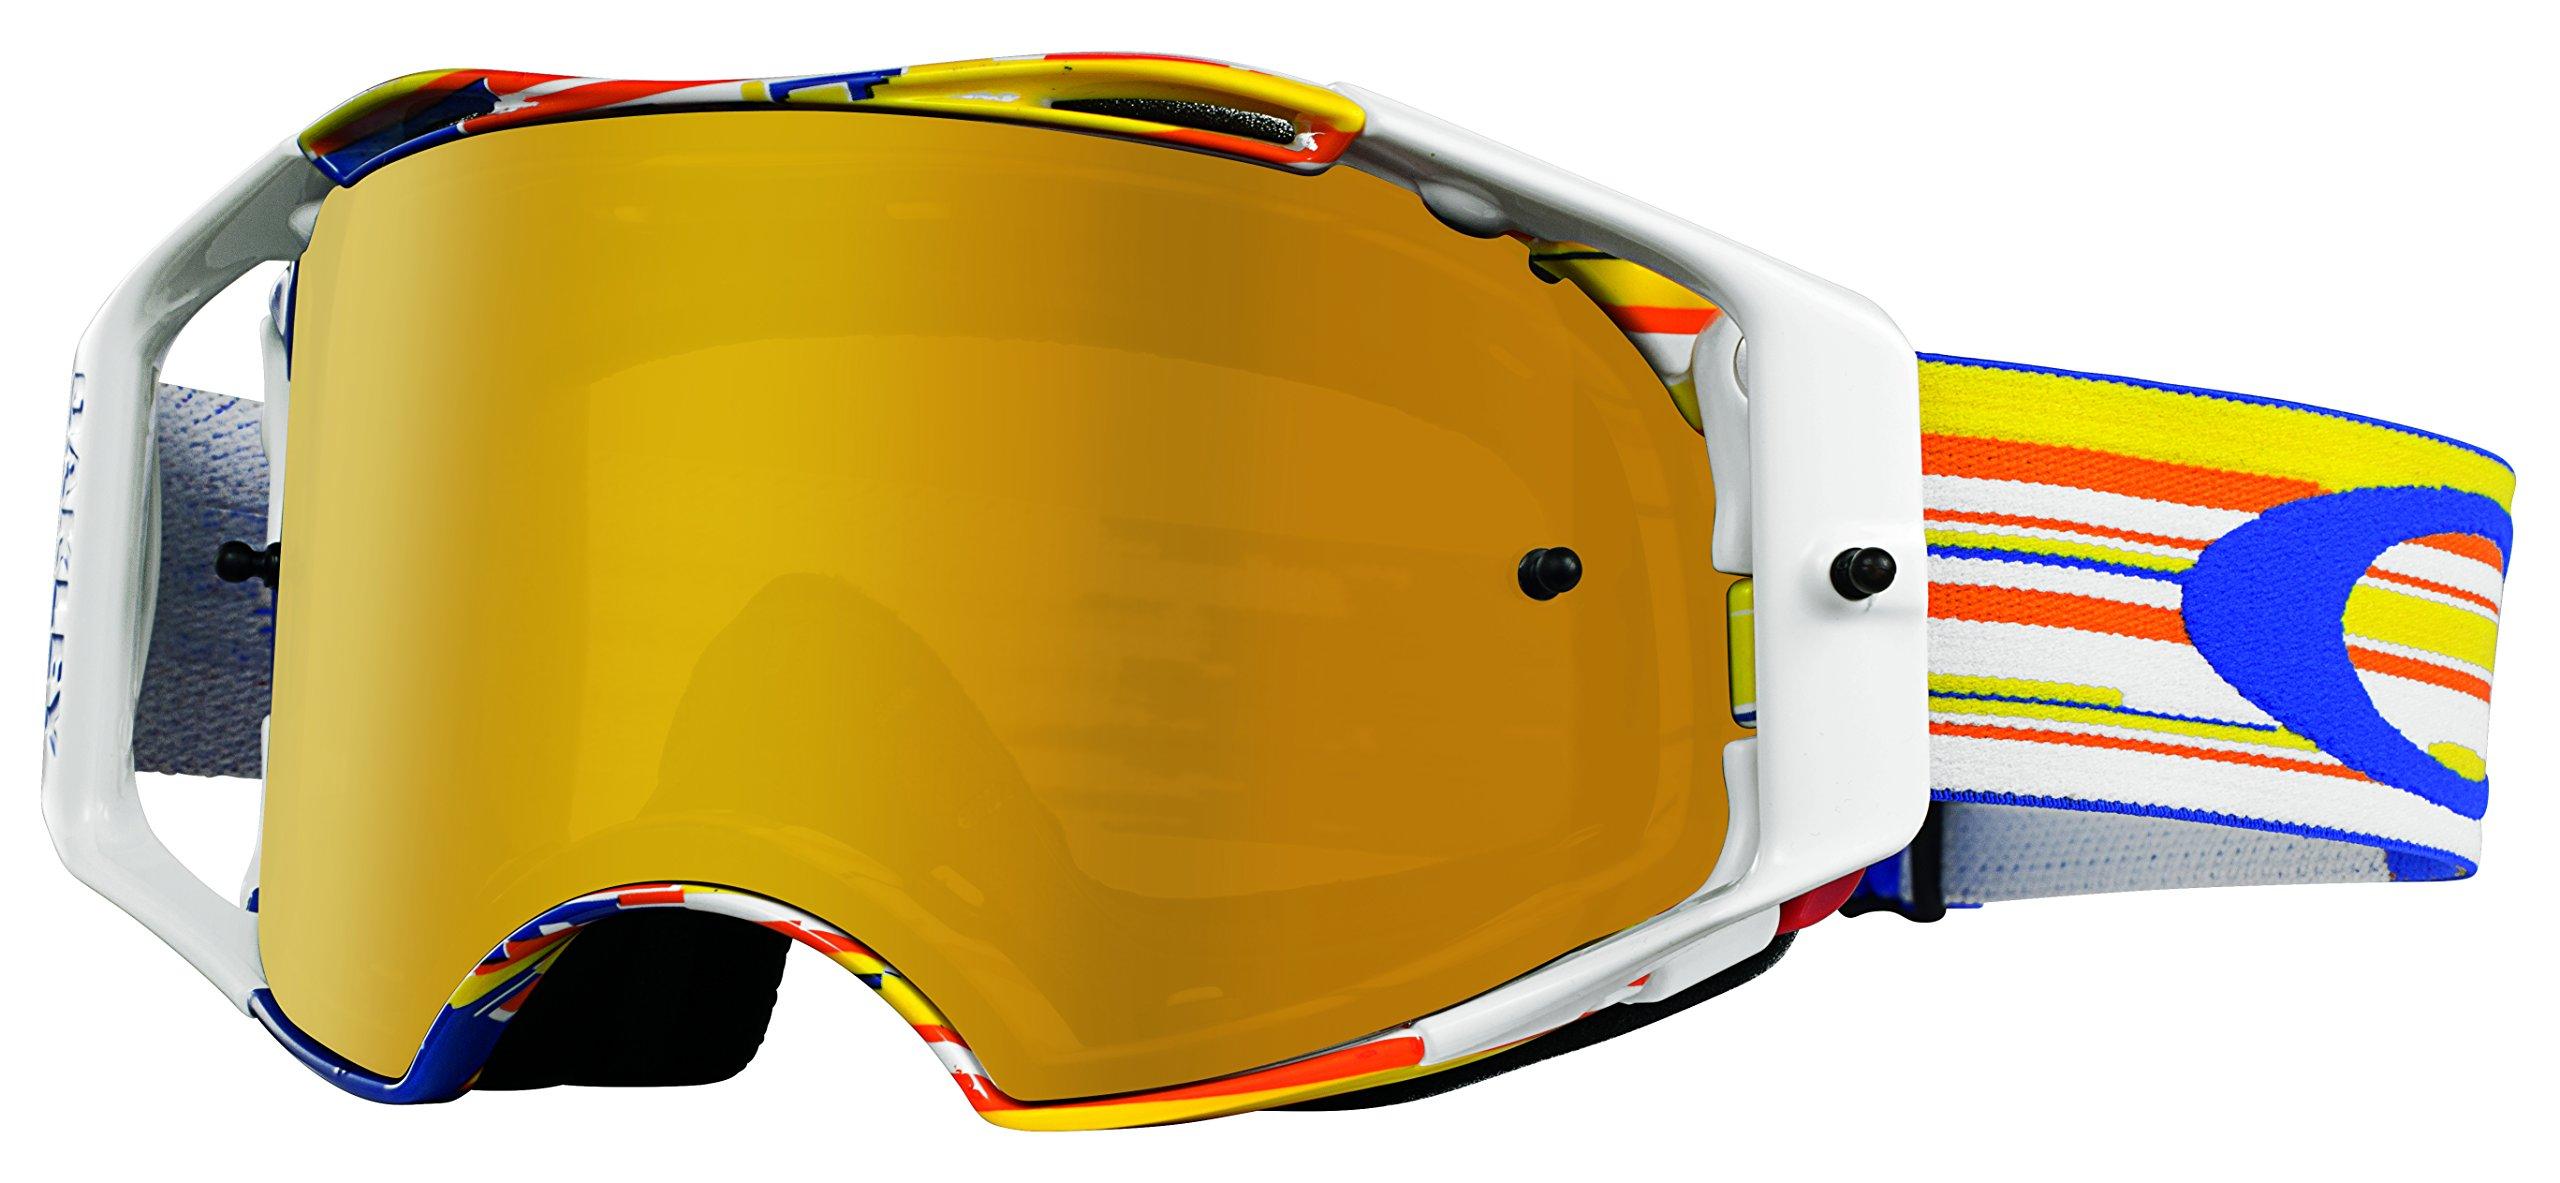 Oakley Airbrake MX Glitch BOG Goggles (White Frame/Fire Iridium Lens)